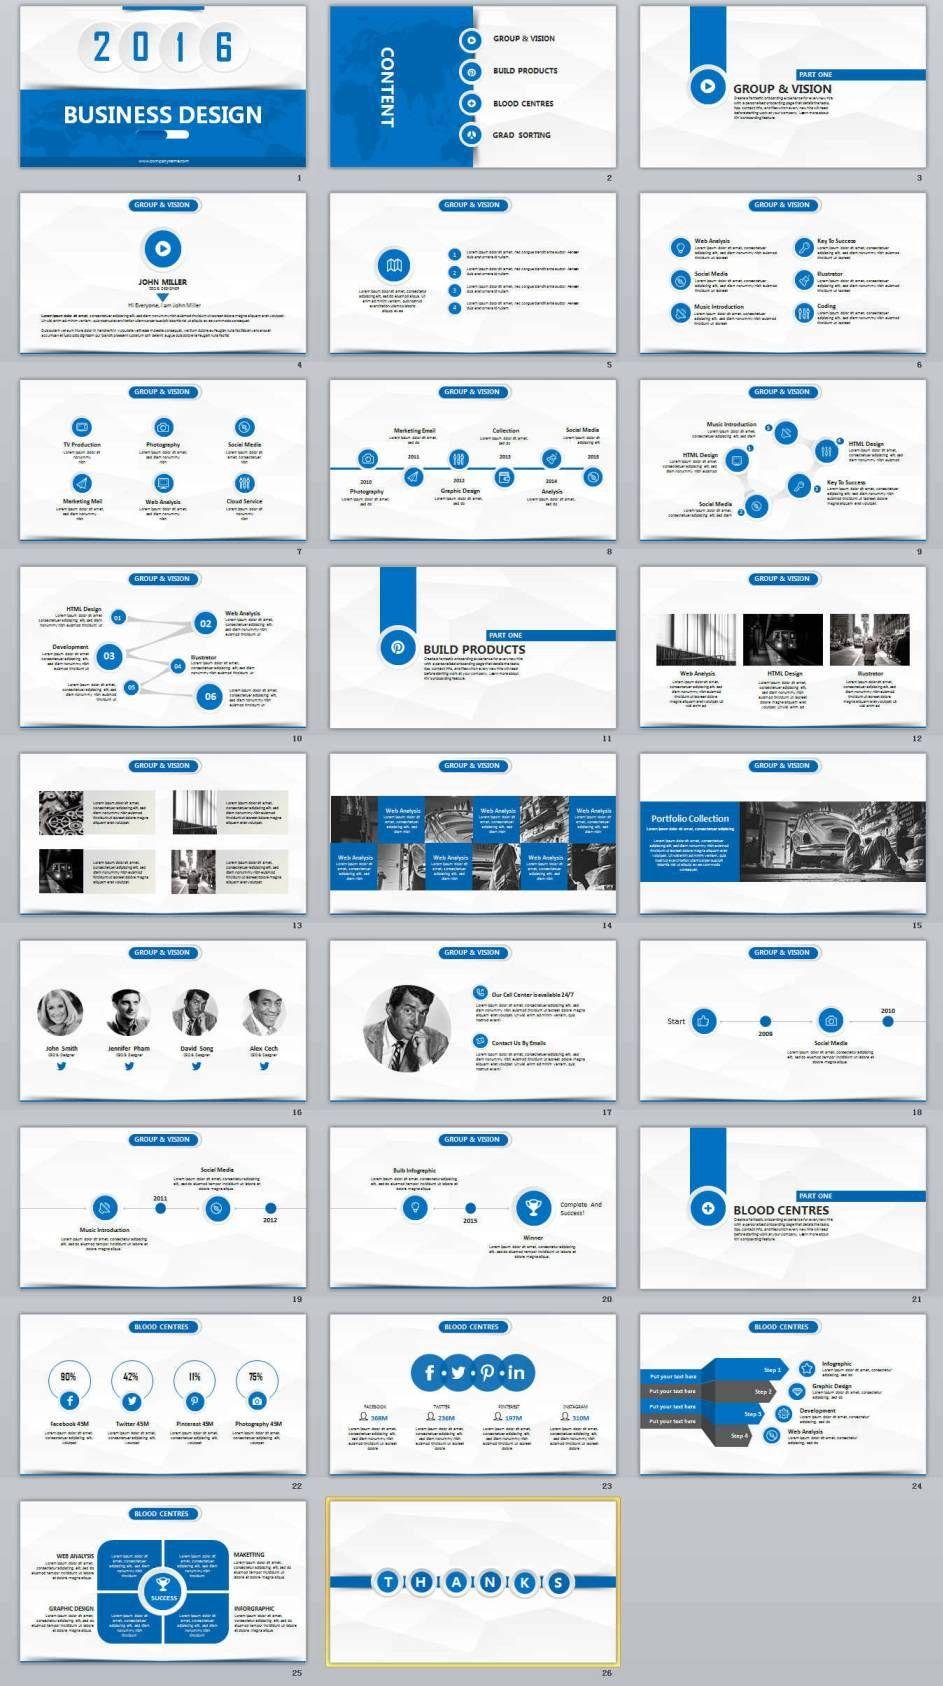 Engineering Design Process Template - valoblogi com